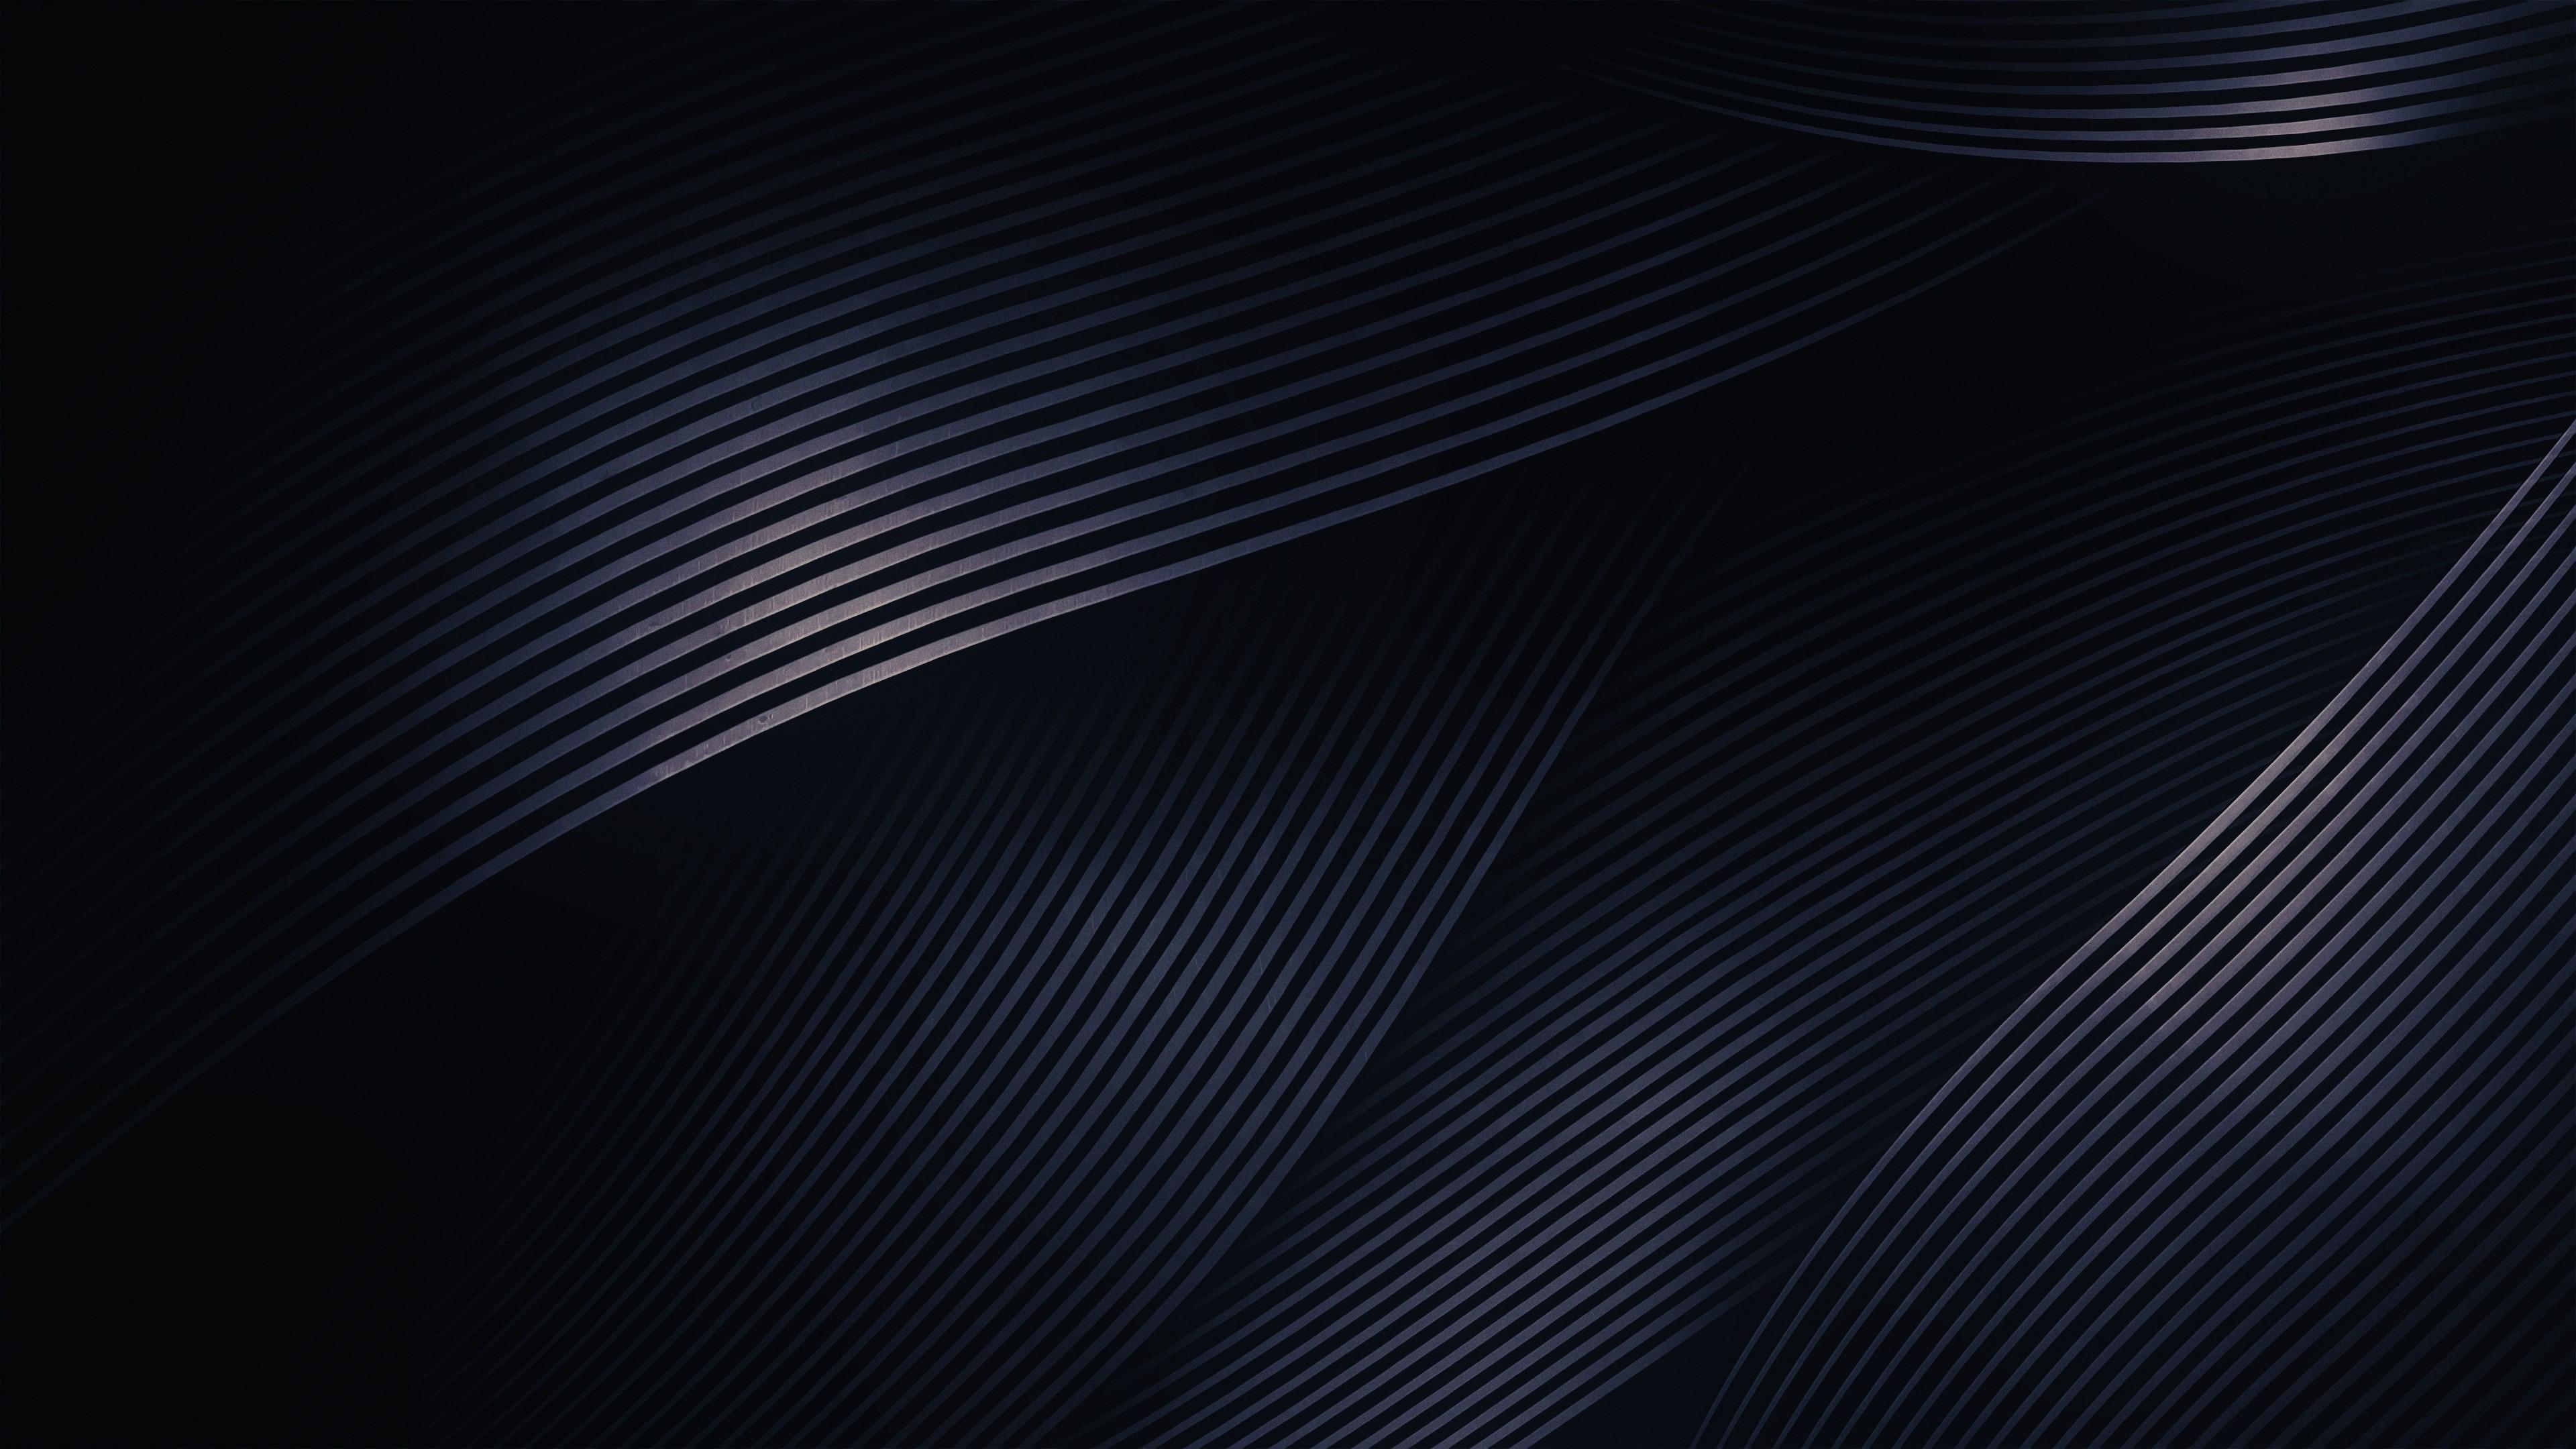 Iphone 6s Carbon Fiber Wallpaper Dark Waves 4k Wallpapers Hd Wallpapers Id 22832